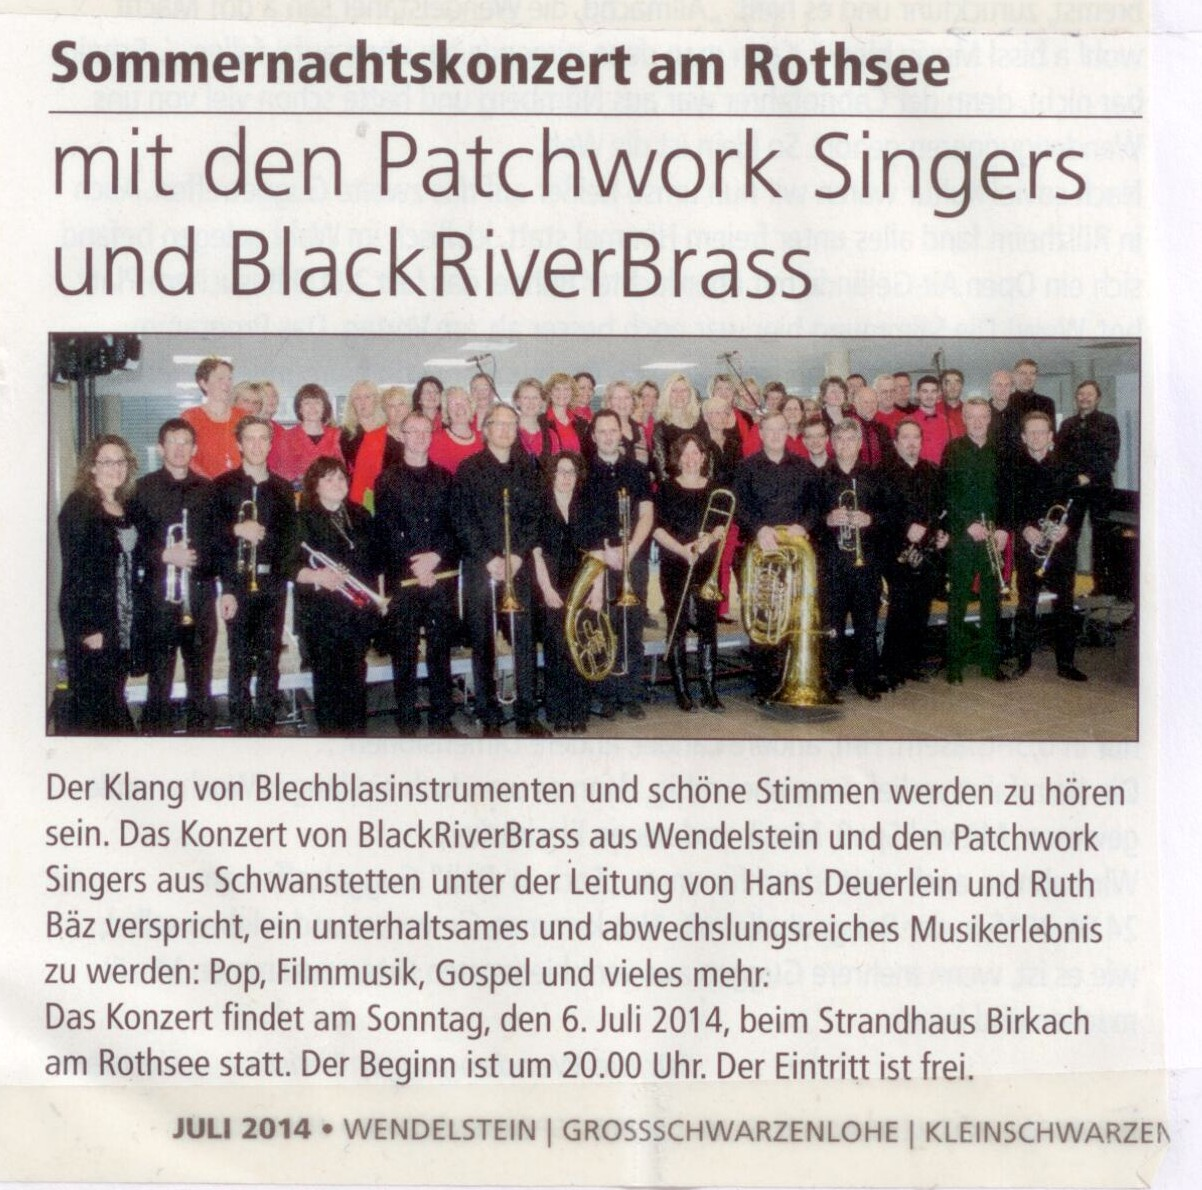 BRB Konzert Rothsee Ankündigung 04 2014